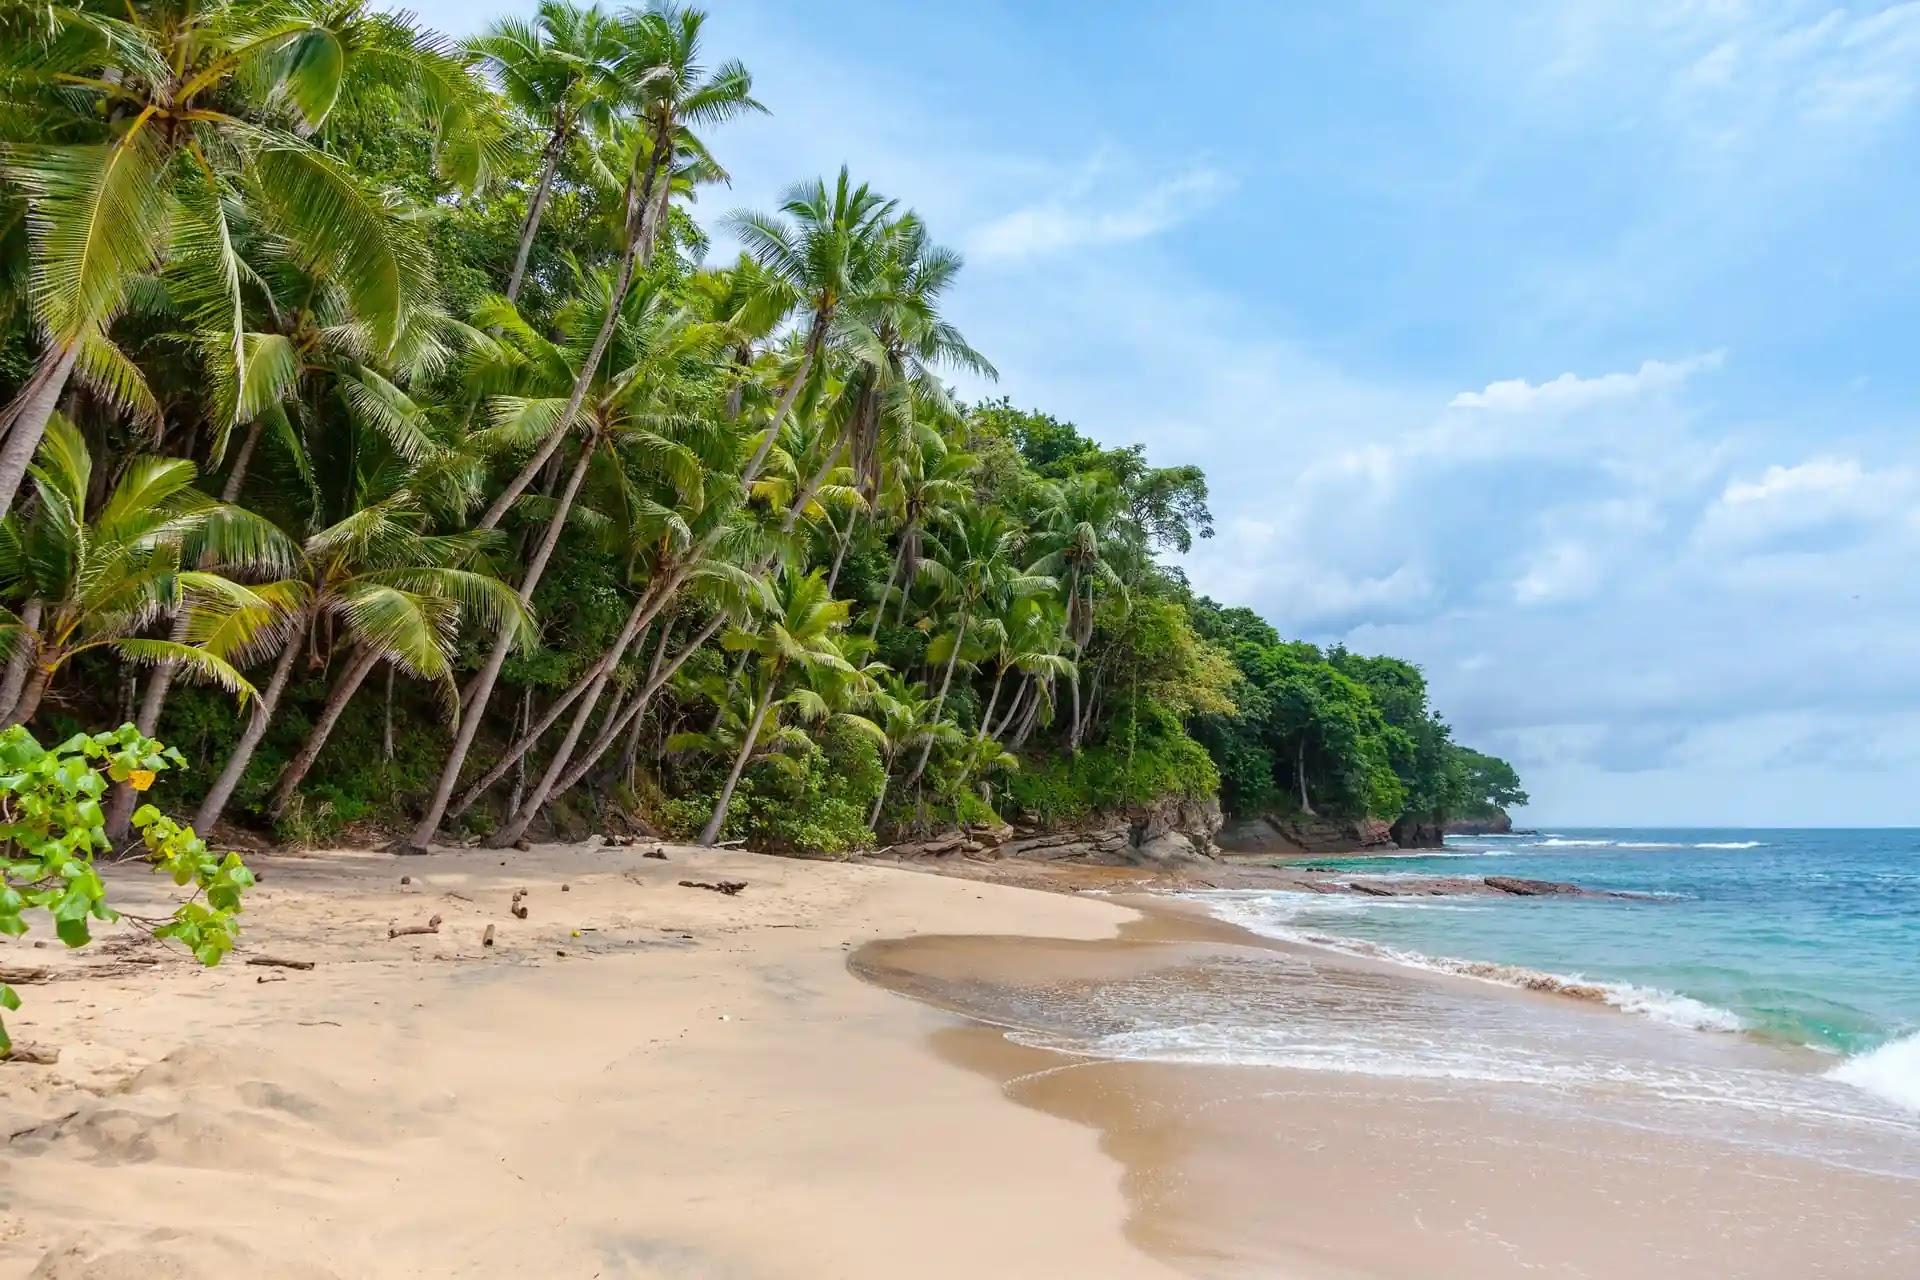 aprende ingles playa arena fina suave palmeras paraiso